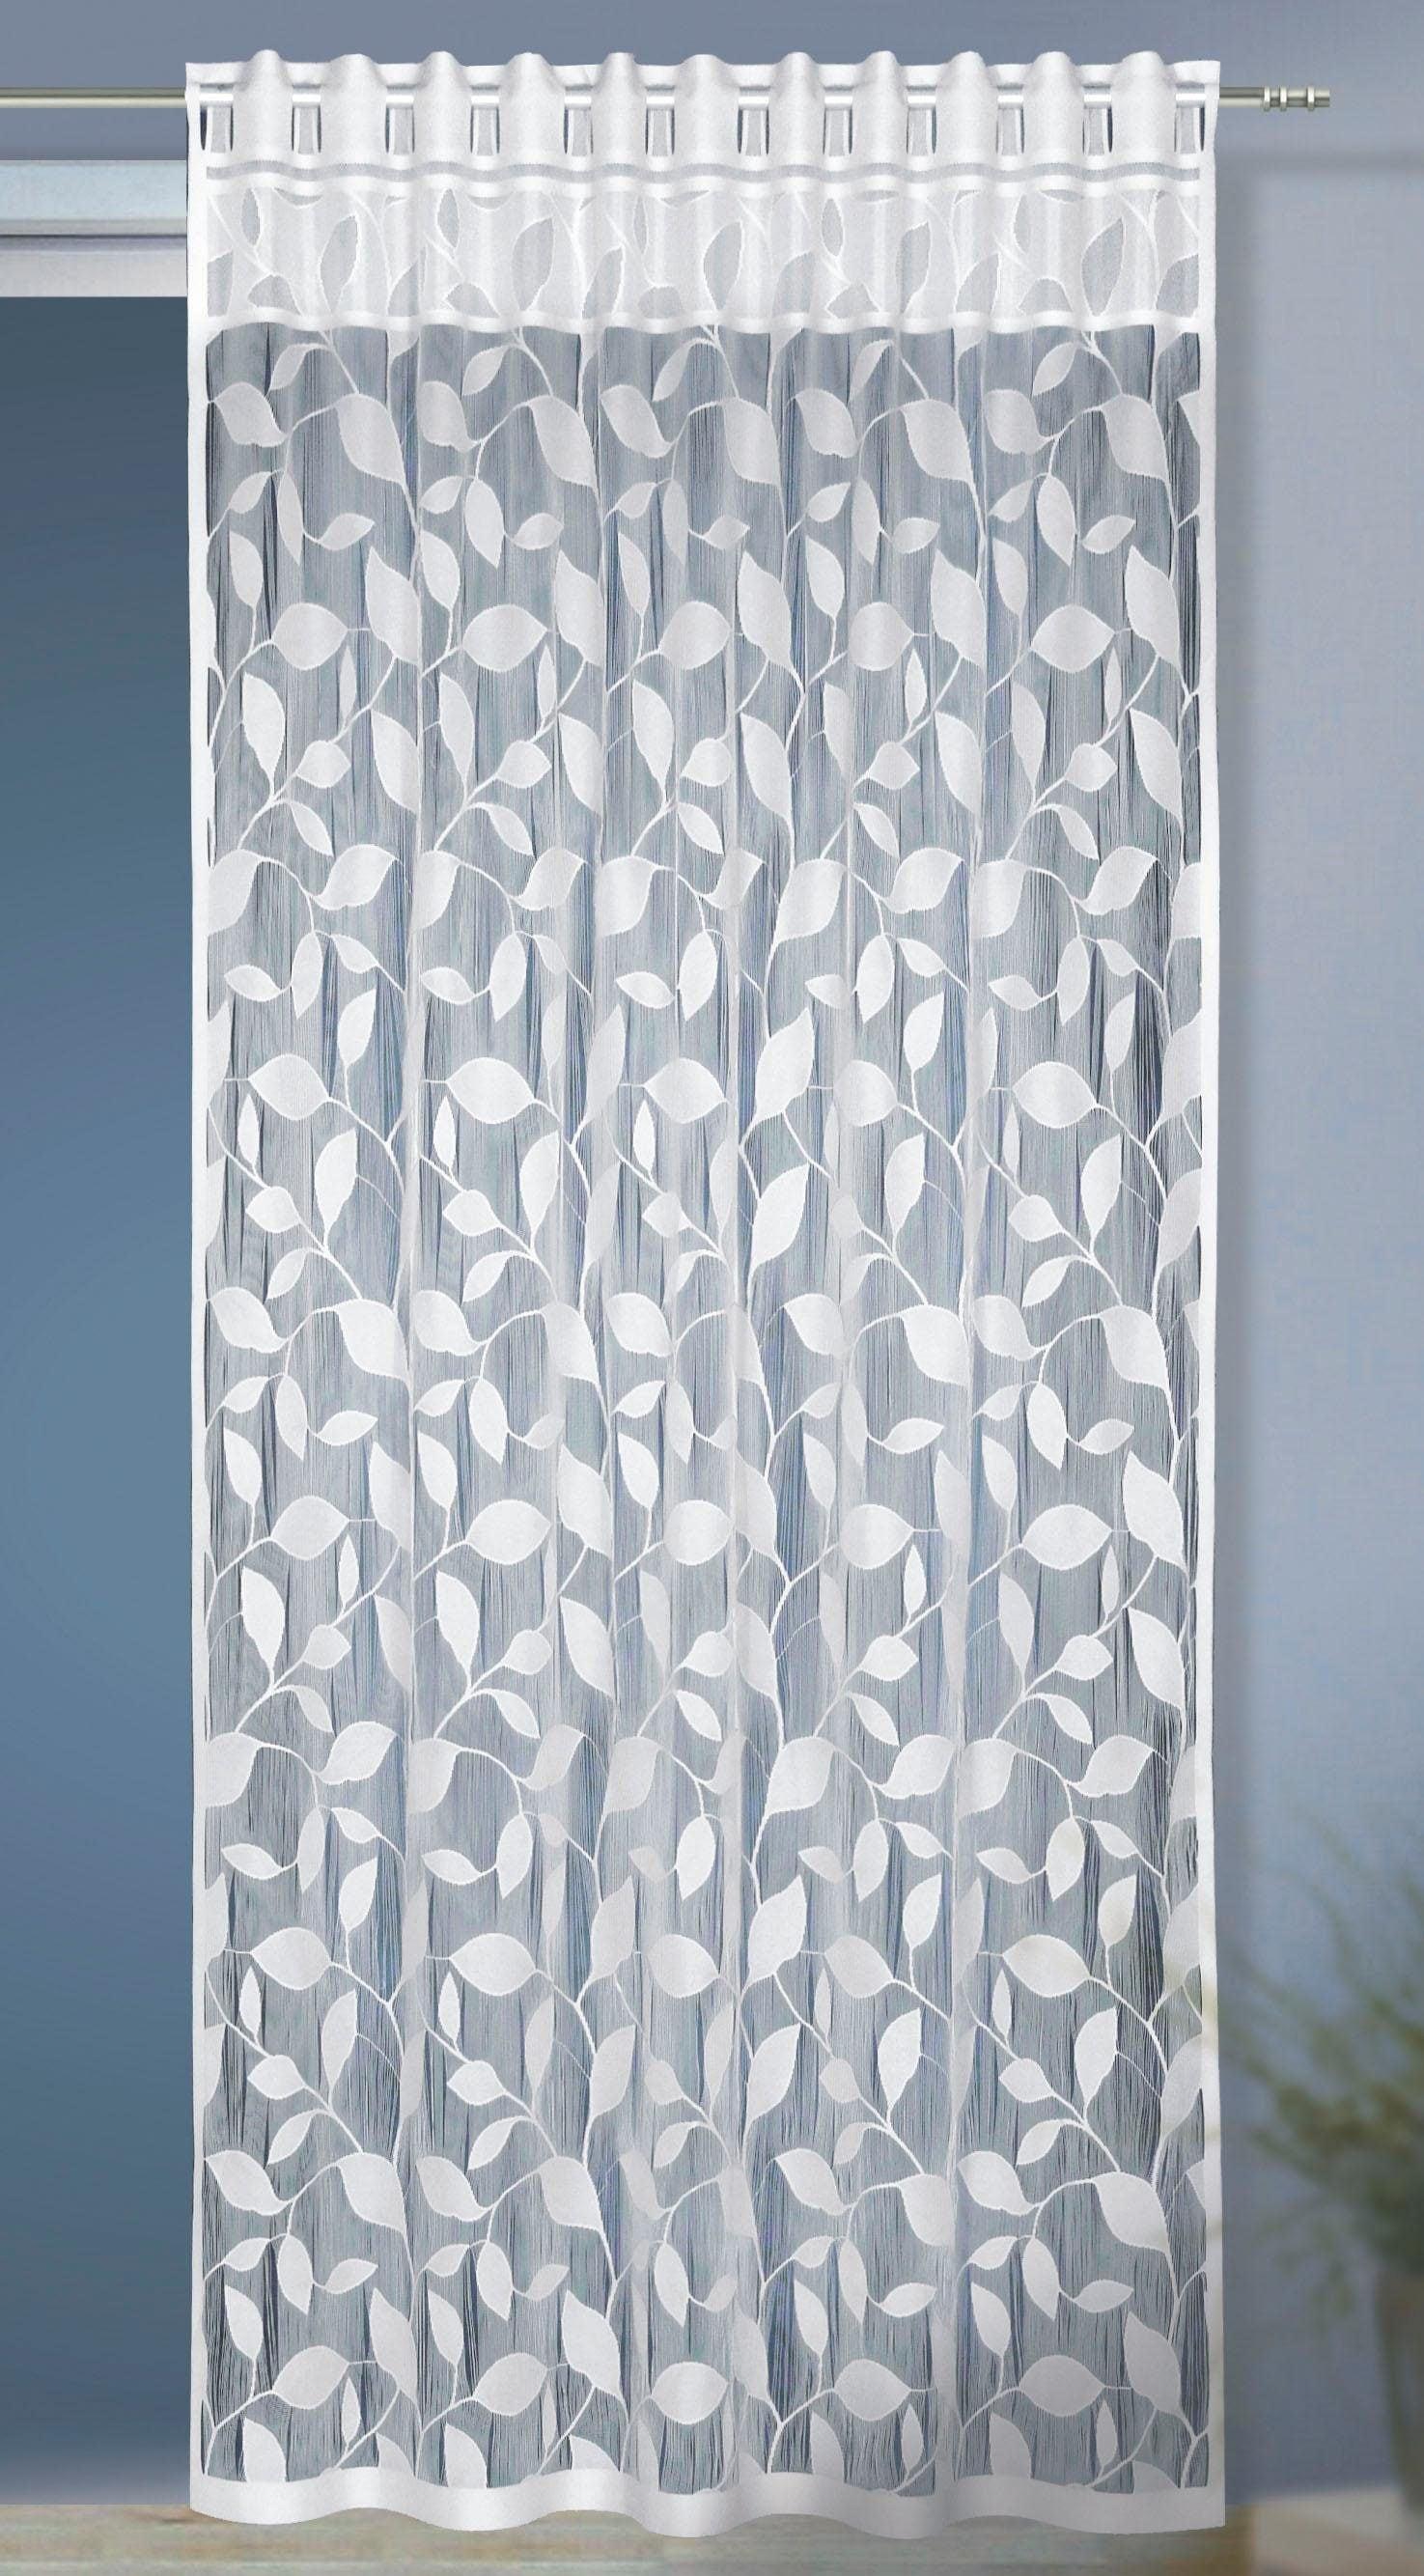 Image of Fadenvorhang, »Kiel«, WILLKOMMEN ZUHAUSE by ALBANI GROUP, Stangendurchzug 1 Stück